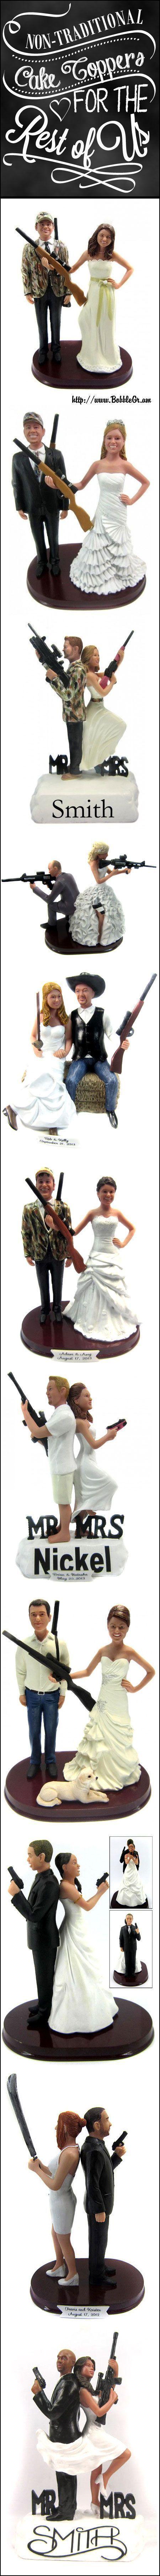 279 best Hockey Wedding Cake Toppers images on Pinterest | Cake ...